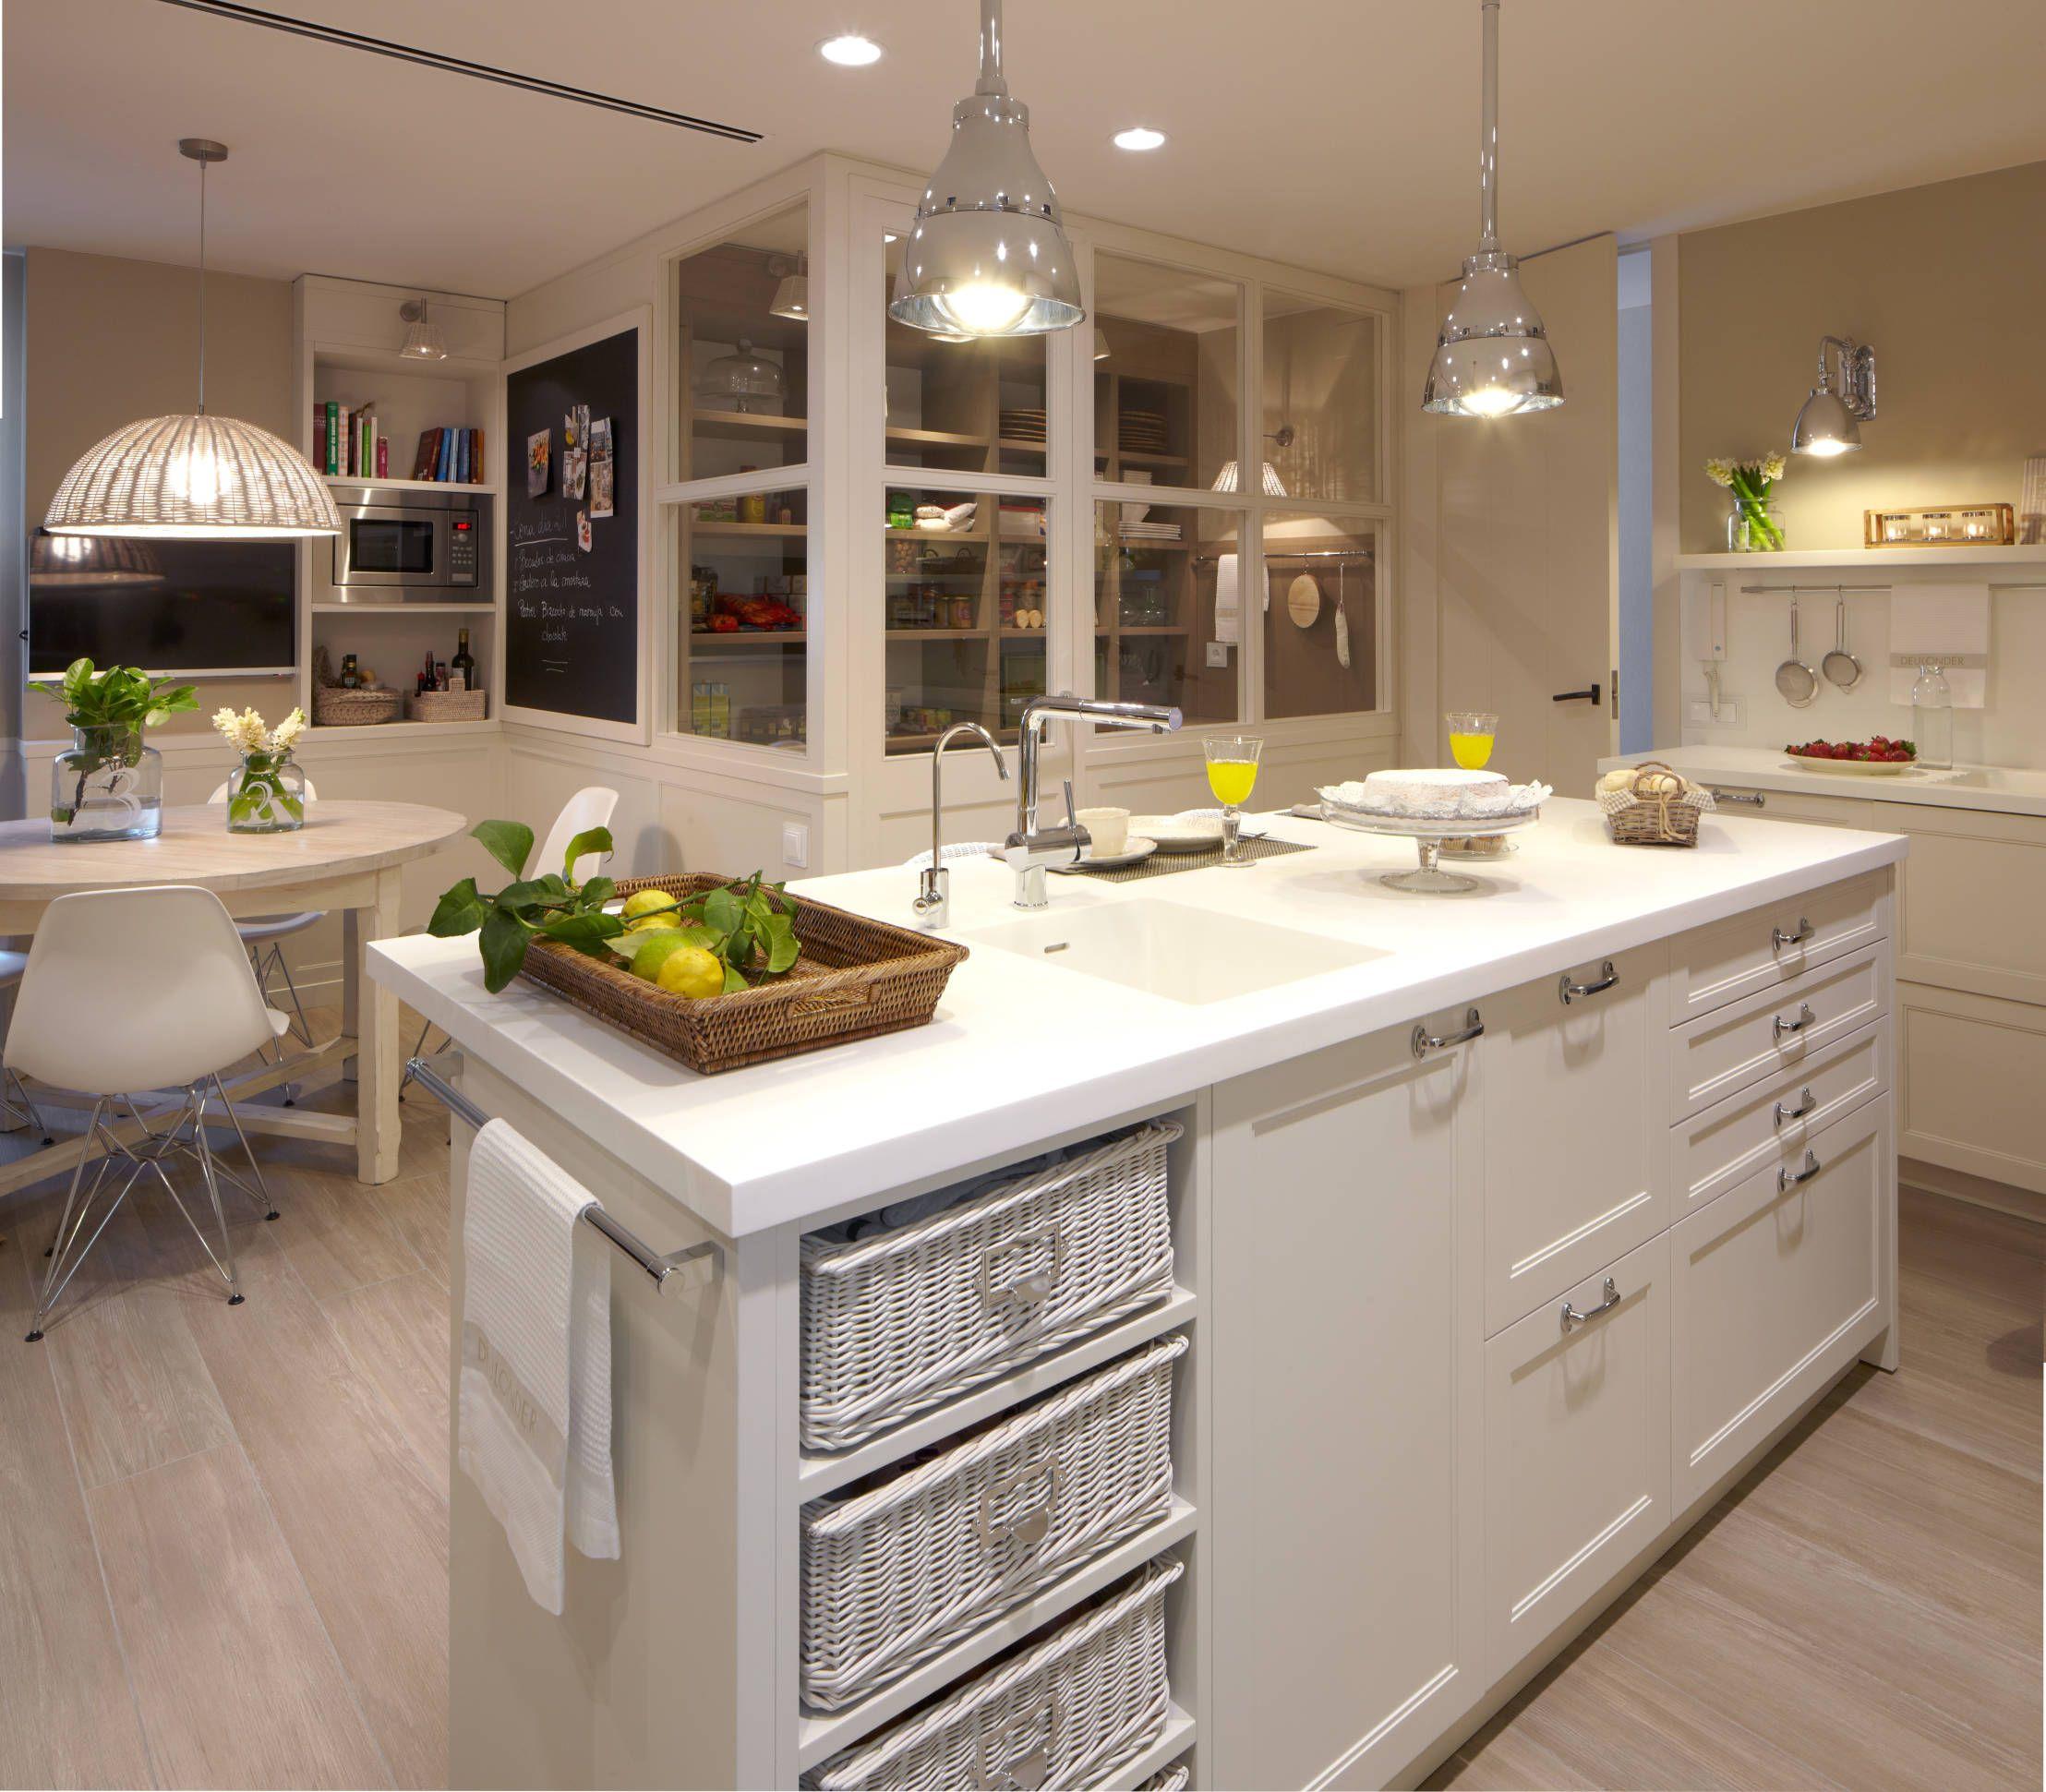 Cocinas con isla: 10 diseños maravillosos | Isla cocina, Cocina con ...